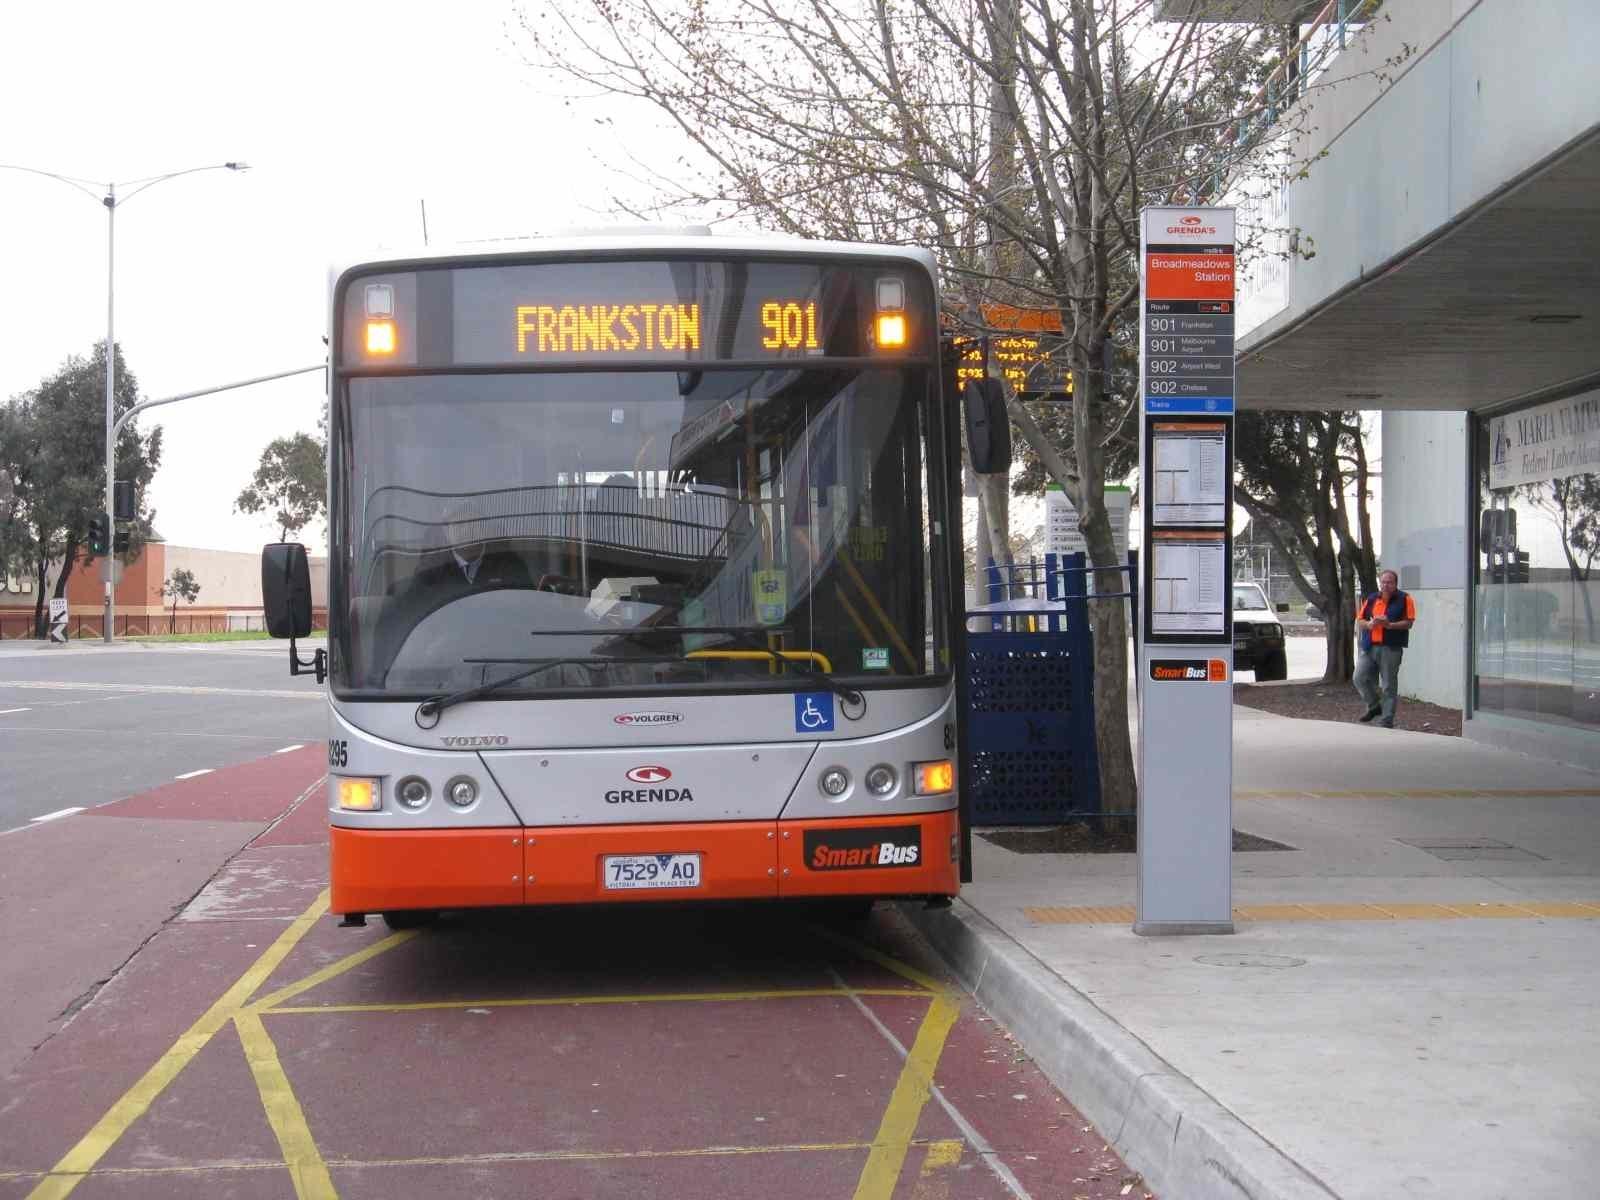 Melbourne On Transit regarding Bus 901 Melbourne Airport Map